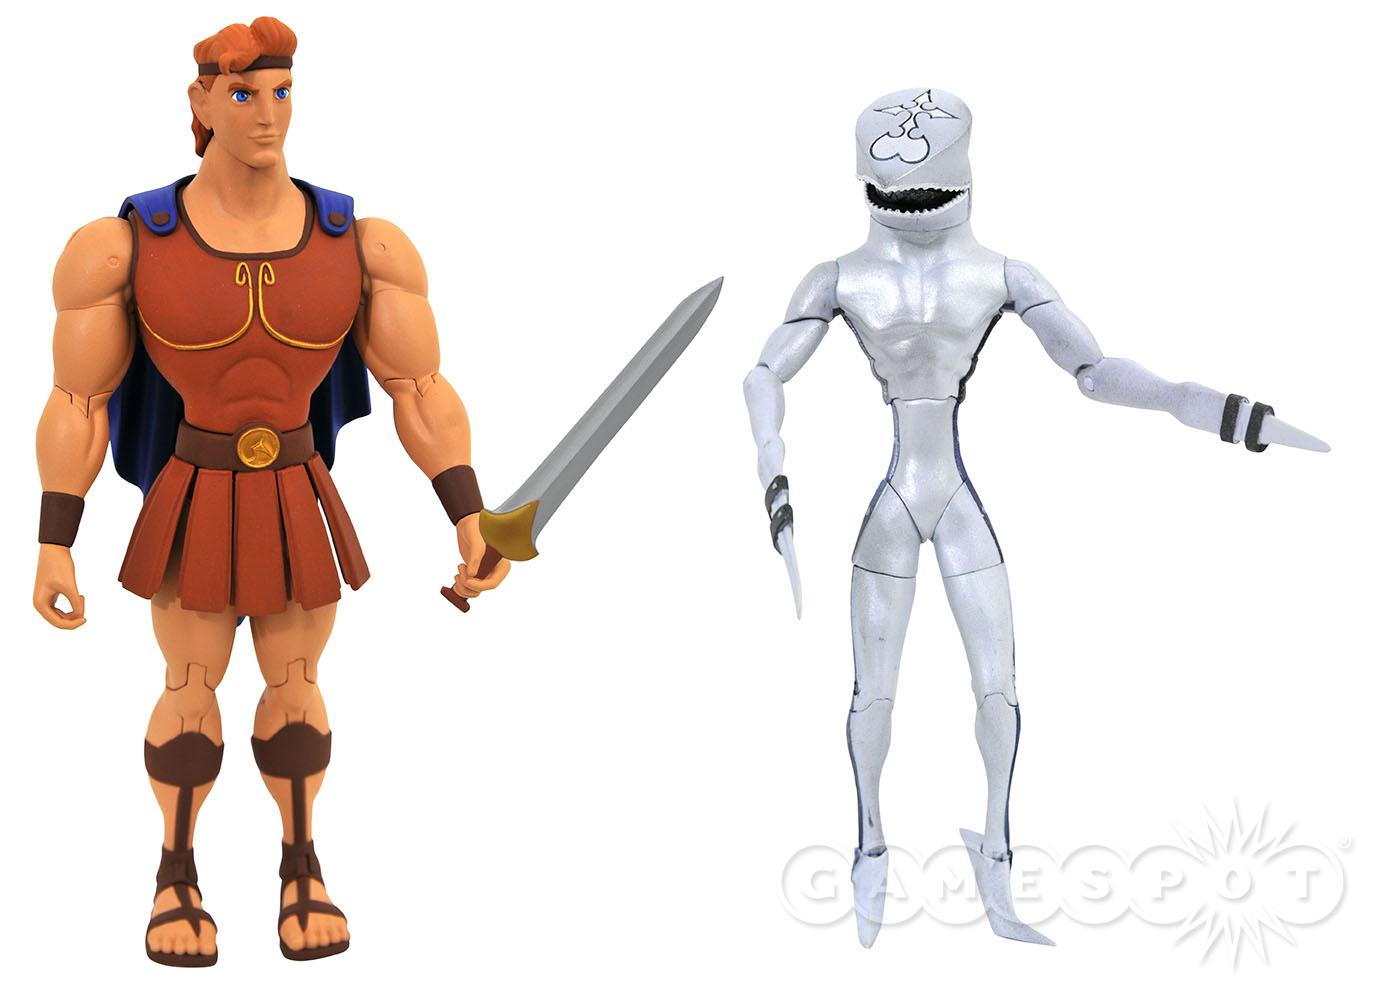 Diamond Select Toys Kingdom Hearts 3 – Sora & Hercules Figures To Debut At New York ToyFair 2019